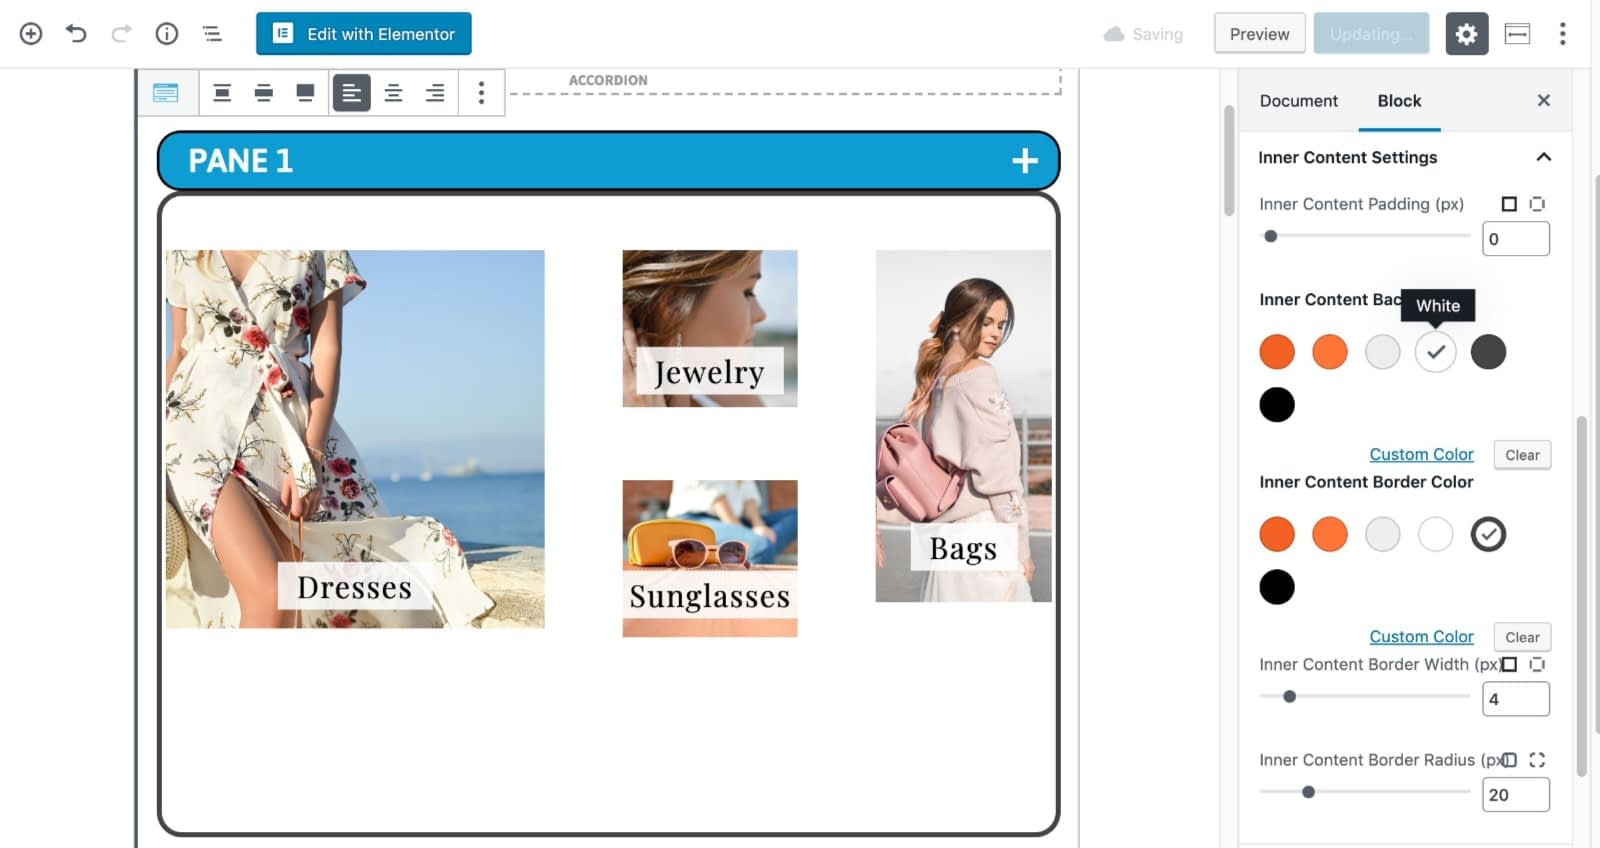 Customize Content Container